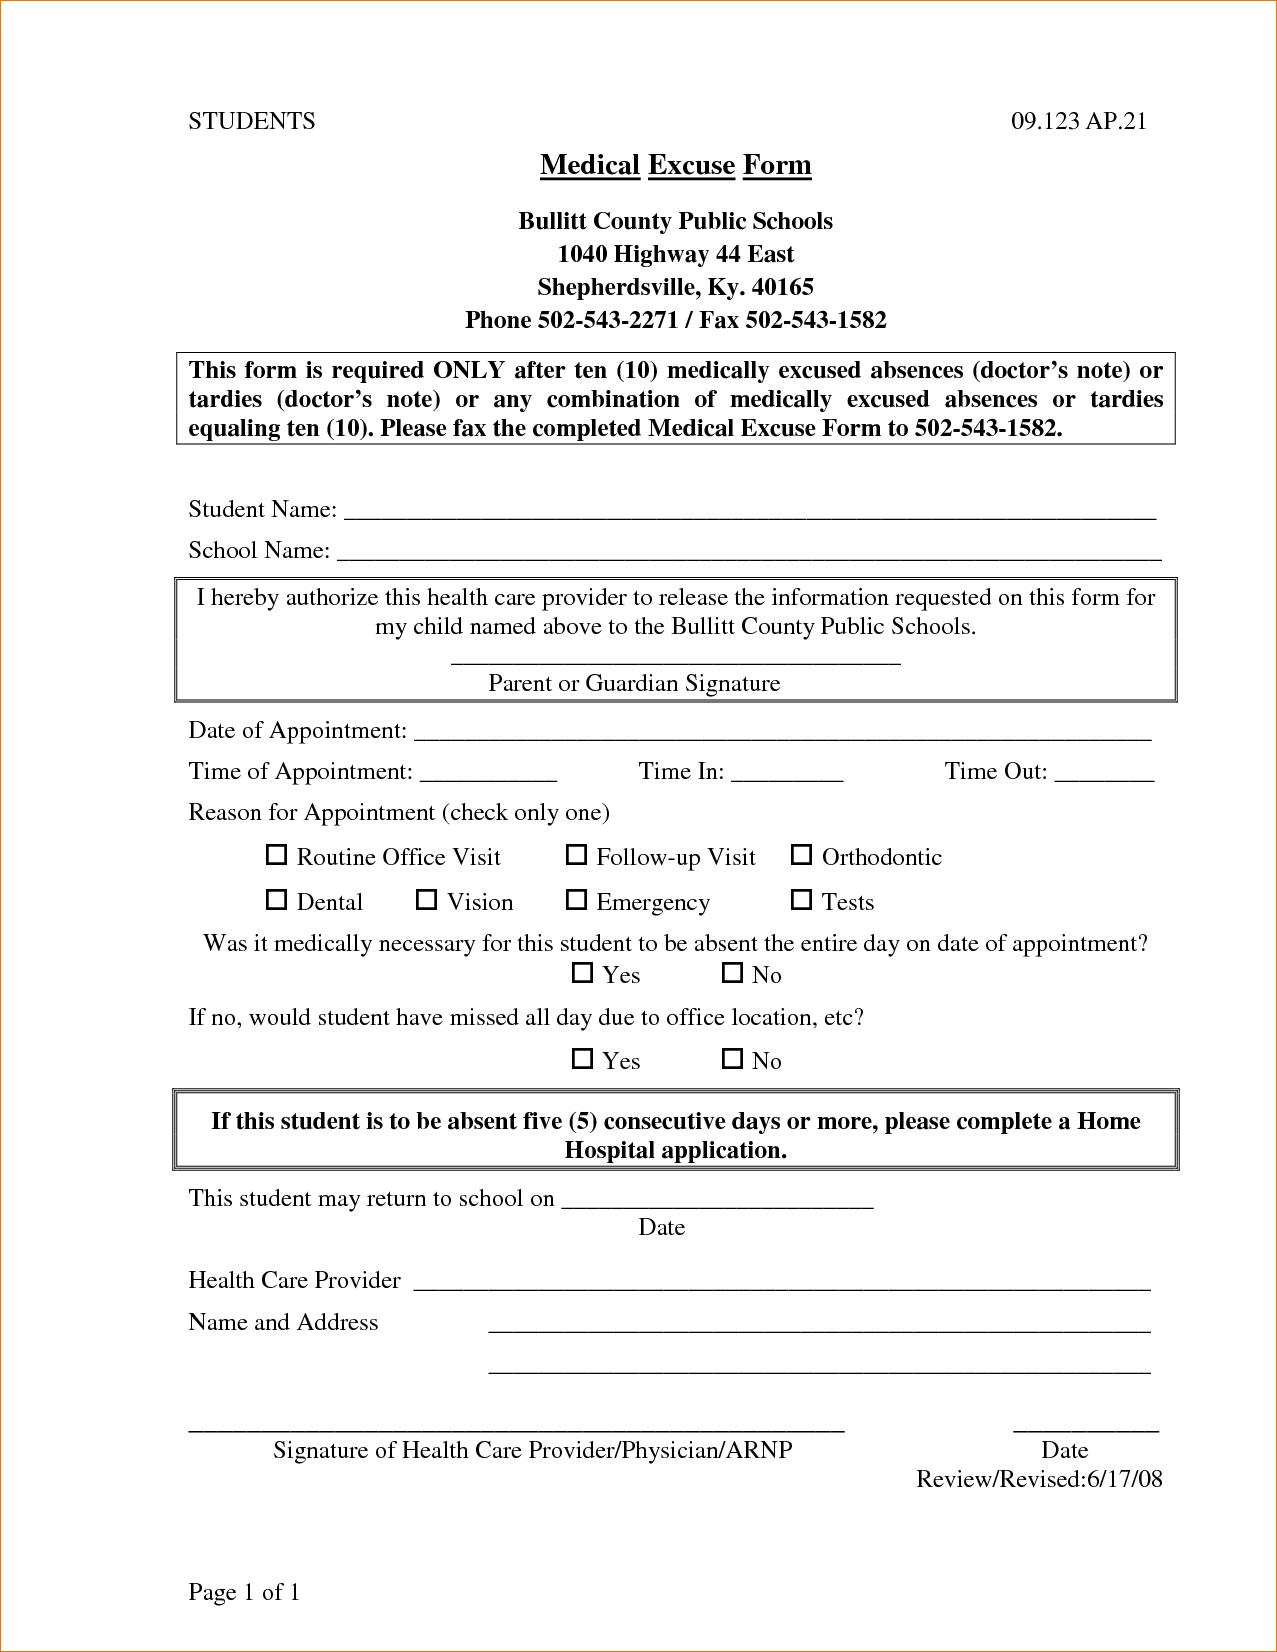 7 Printable Fake Doctors Notes Freeagenda Template Sample | Agenda - Printable Fake Doctors Notes Free